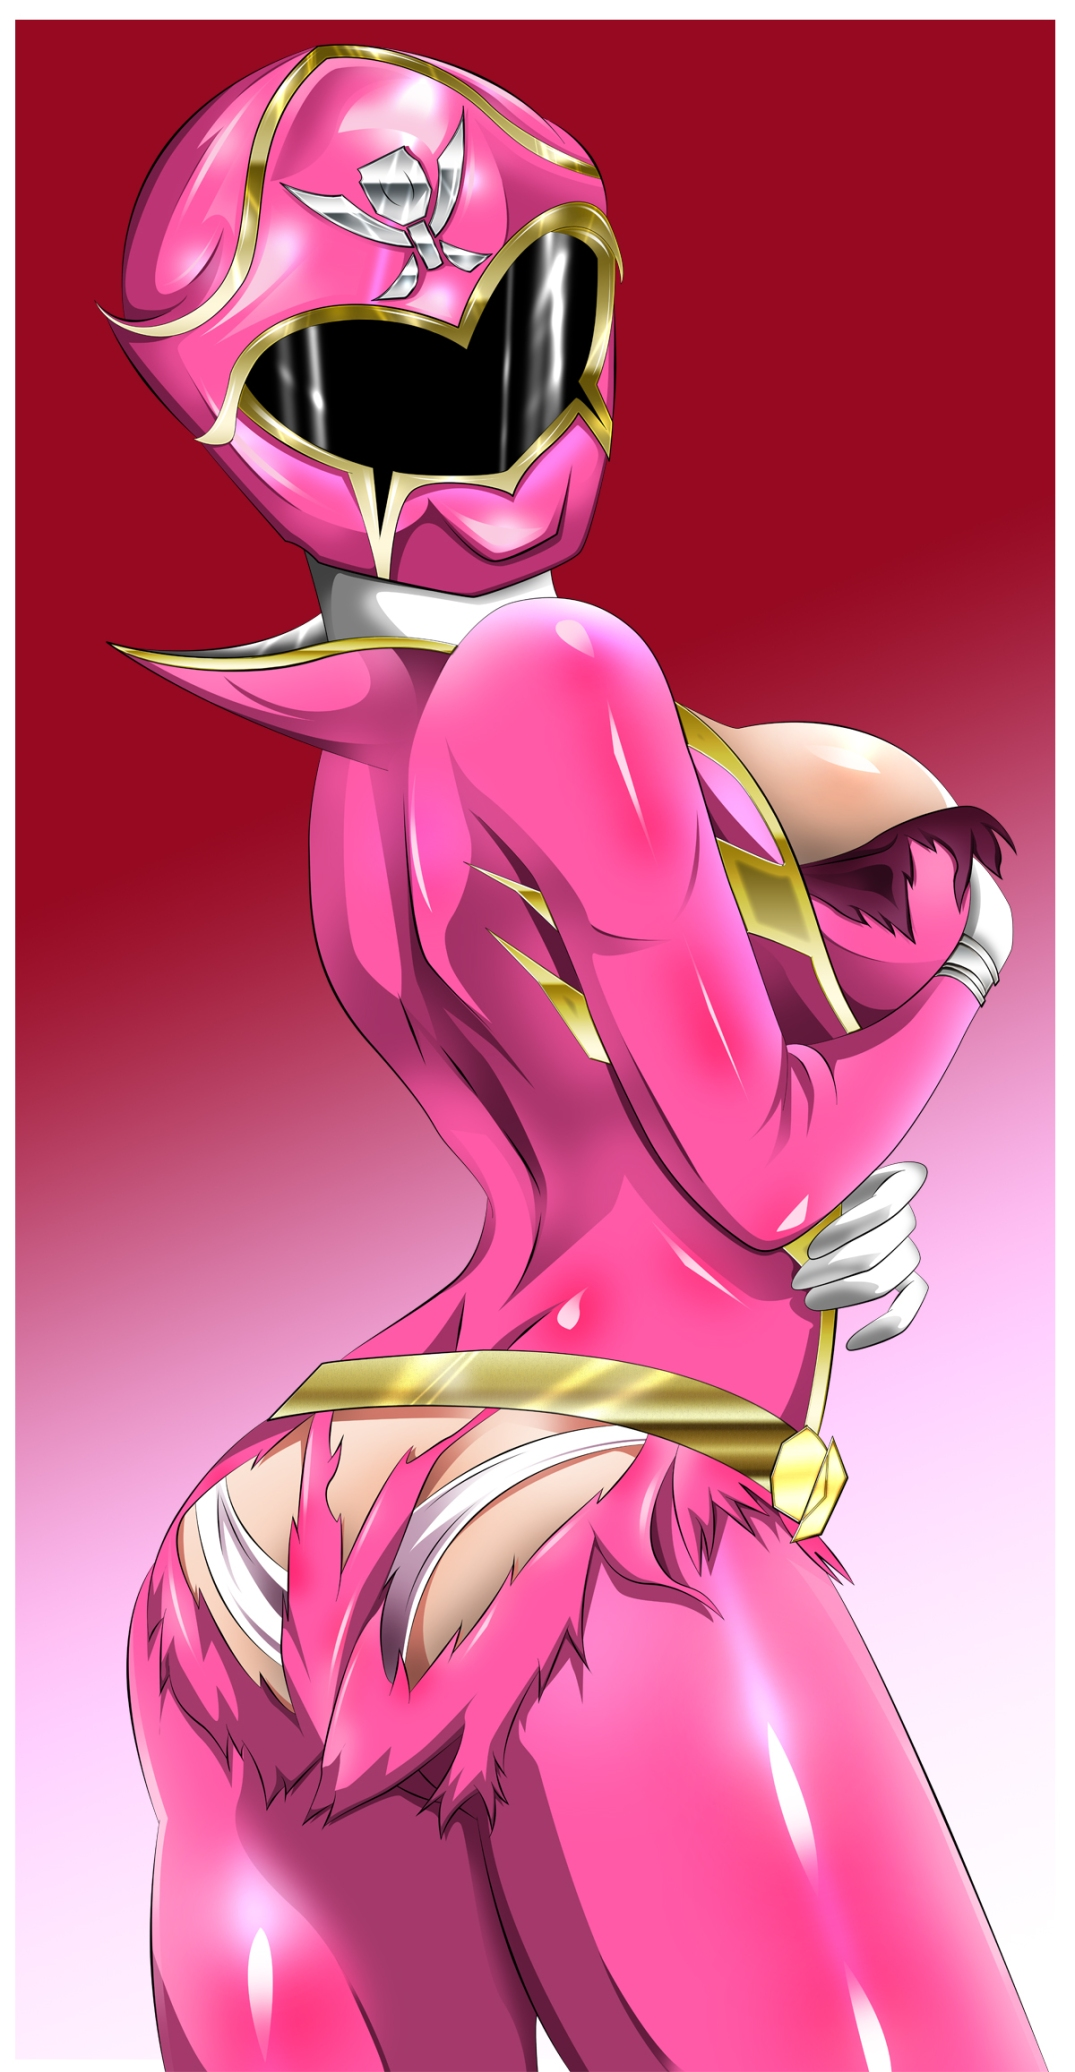 gina bellman ass nude